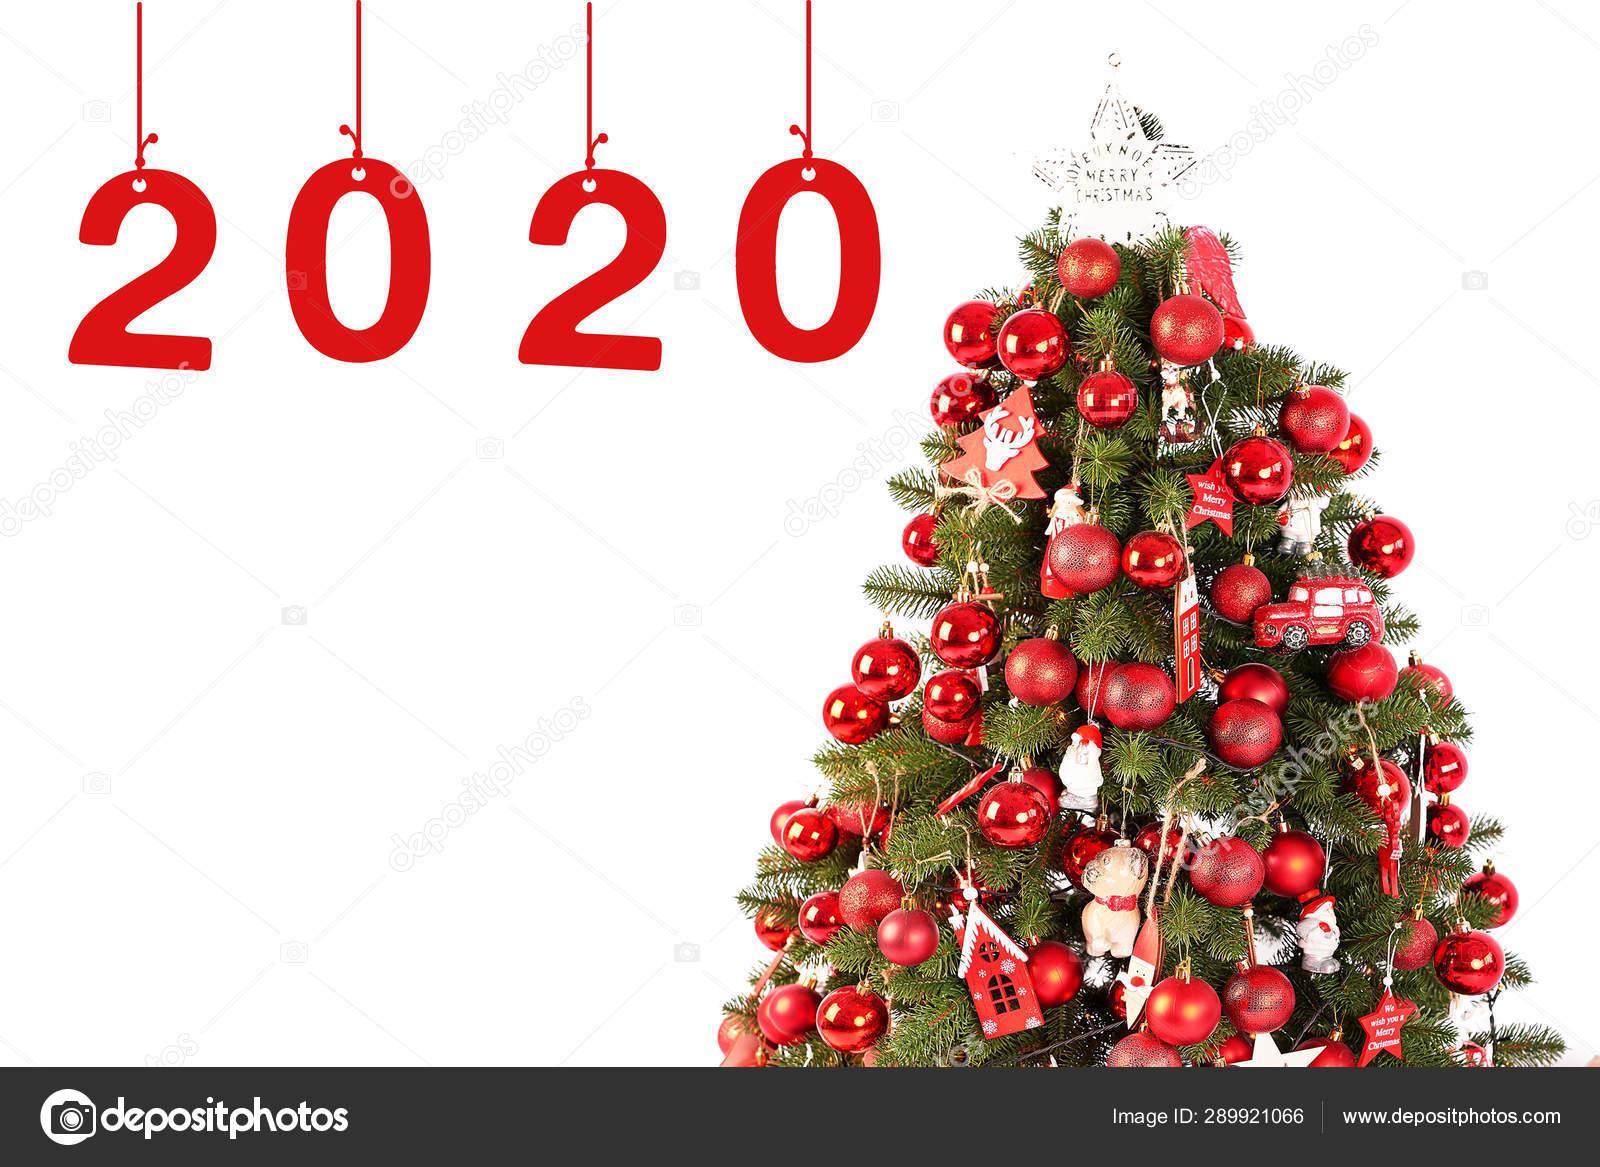 Christmas Card Template 2020 Year Christmas Tree White Background Isolated Stock Photo C Yarovoy Aleksandr 289921066